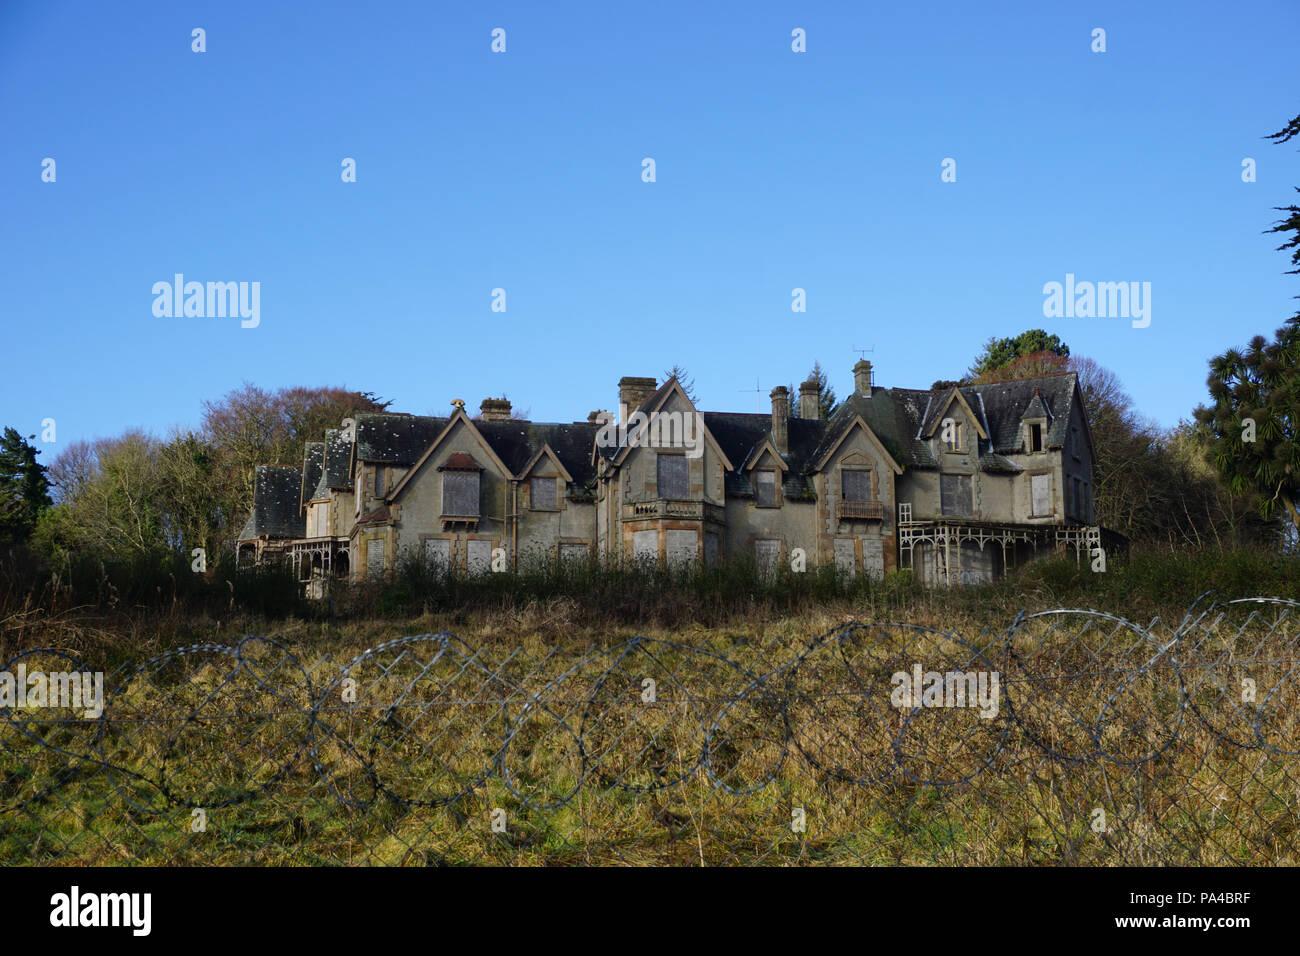 Northern Ireland's most haunted house, Abandoned villa - Stock Image